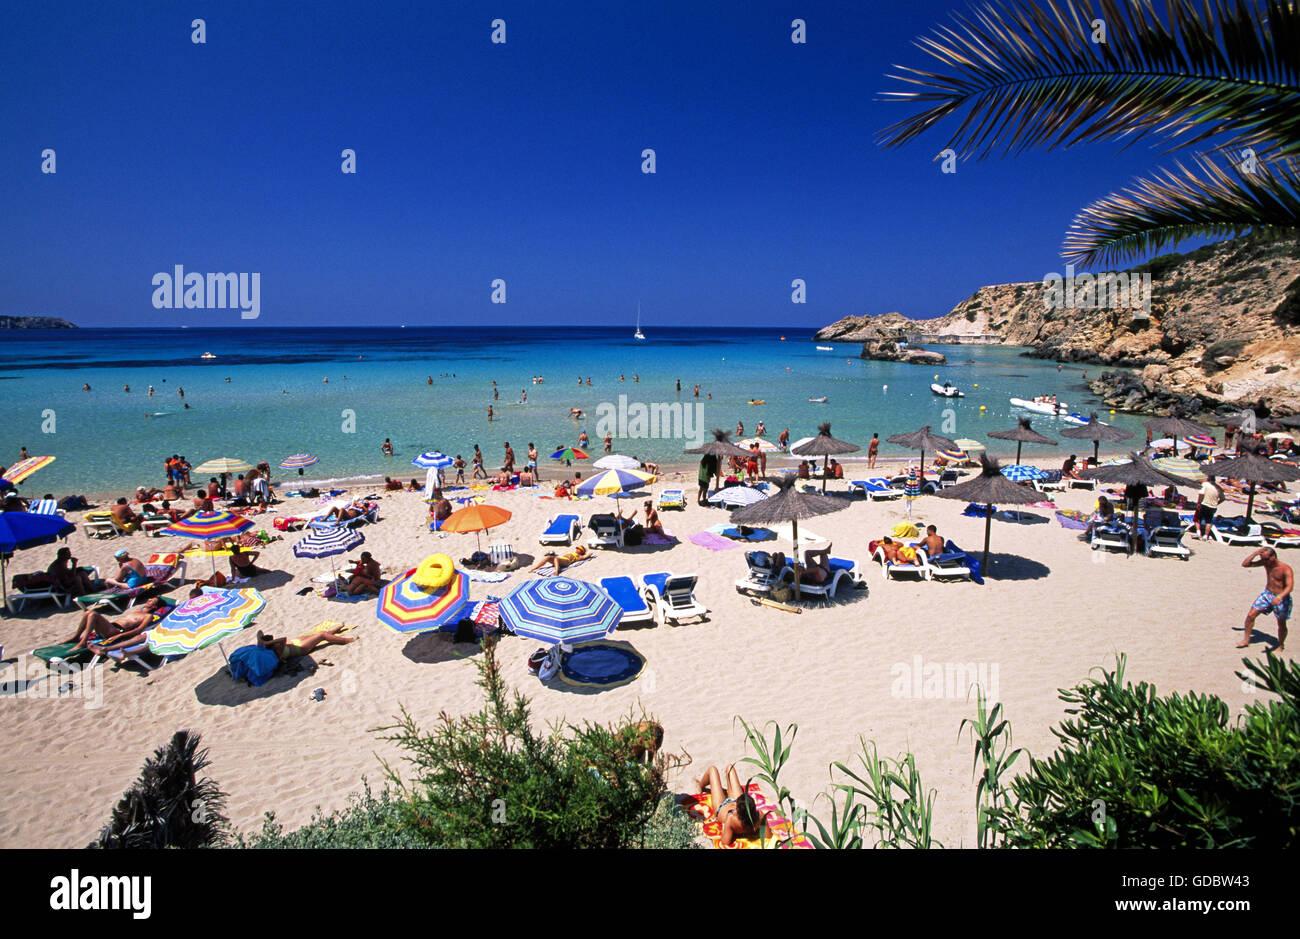 Cala Tarida, Ibiza, Balearic Islands, Spain - Stock Image